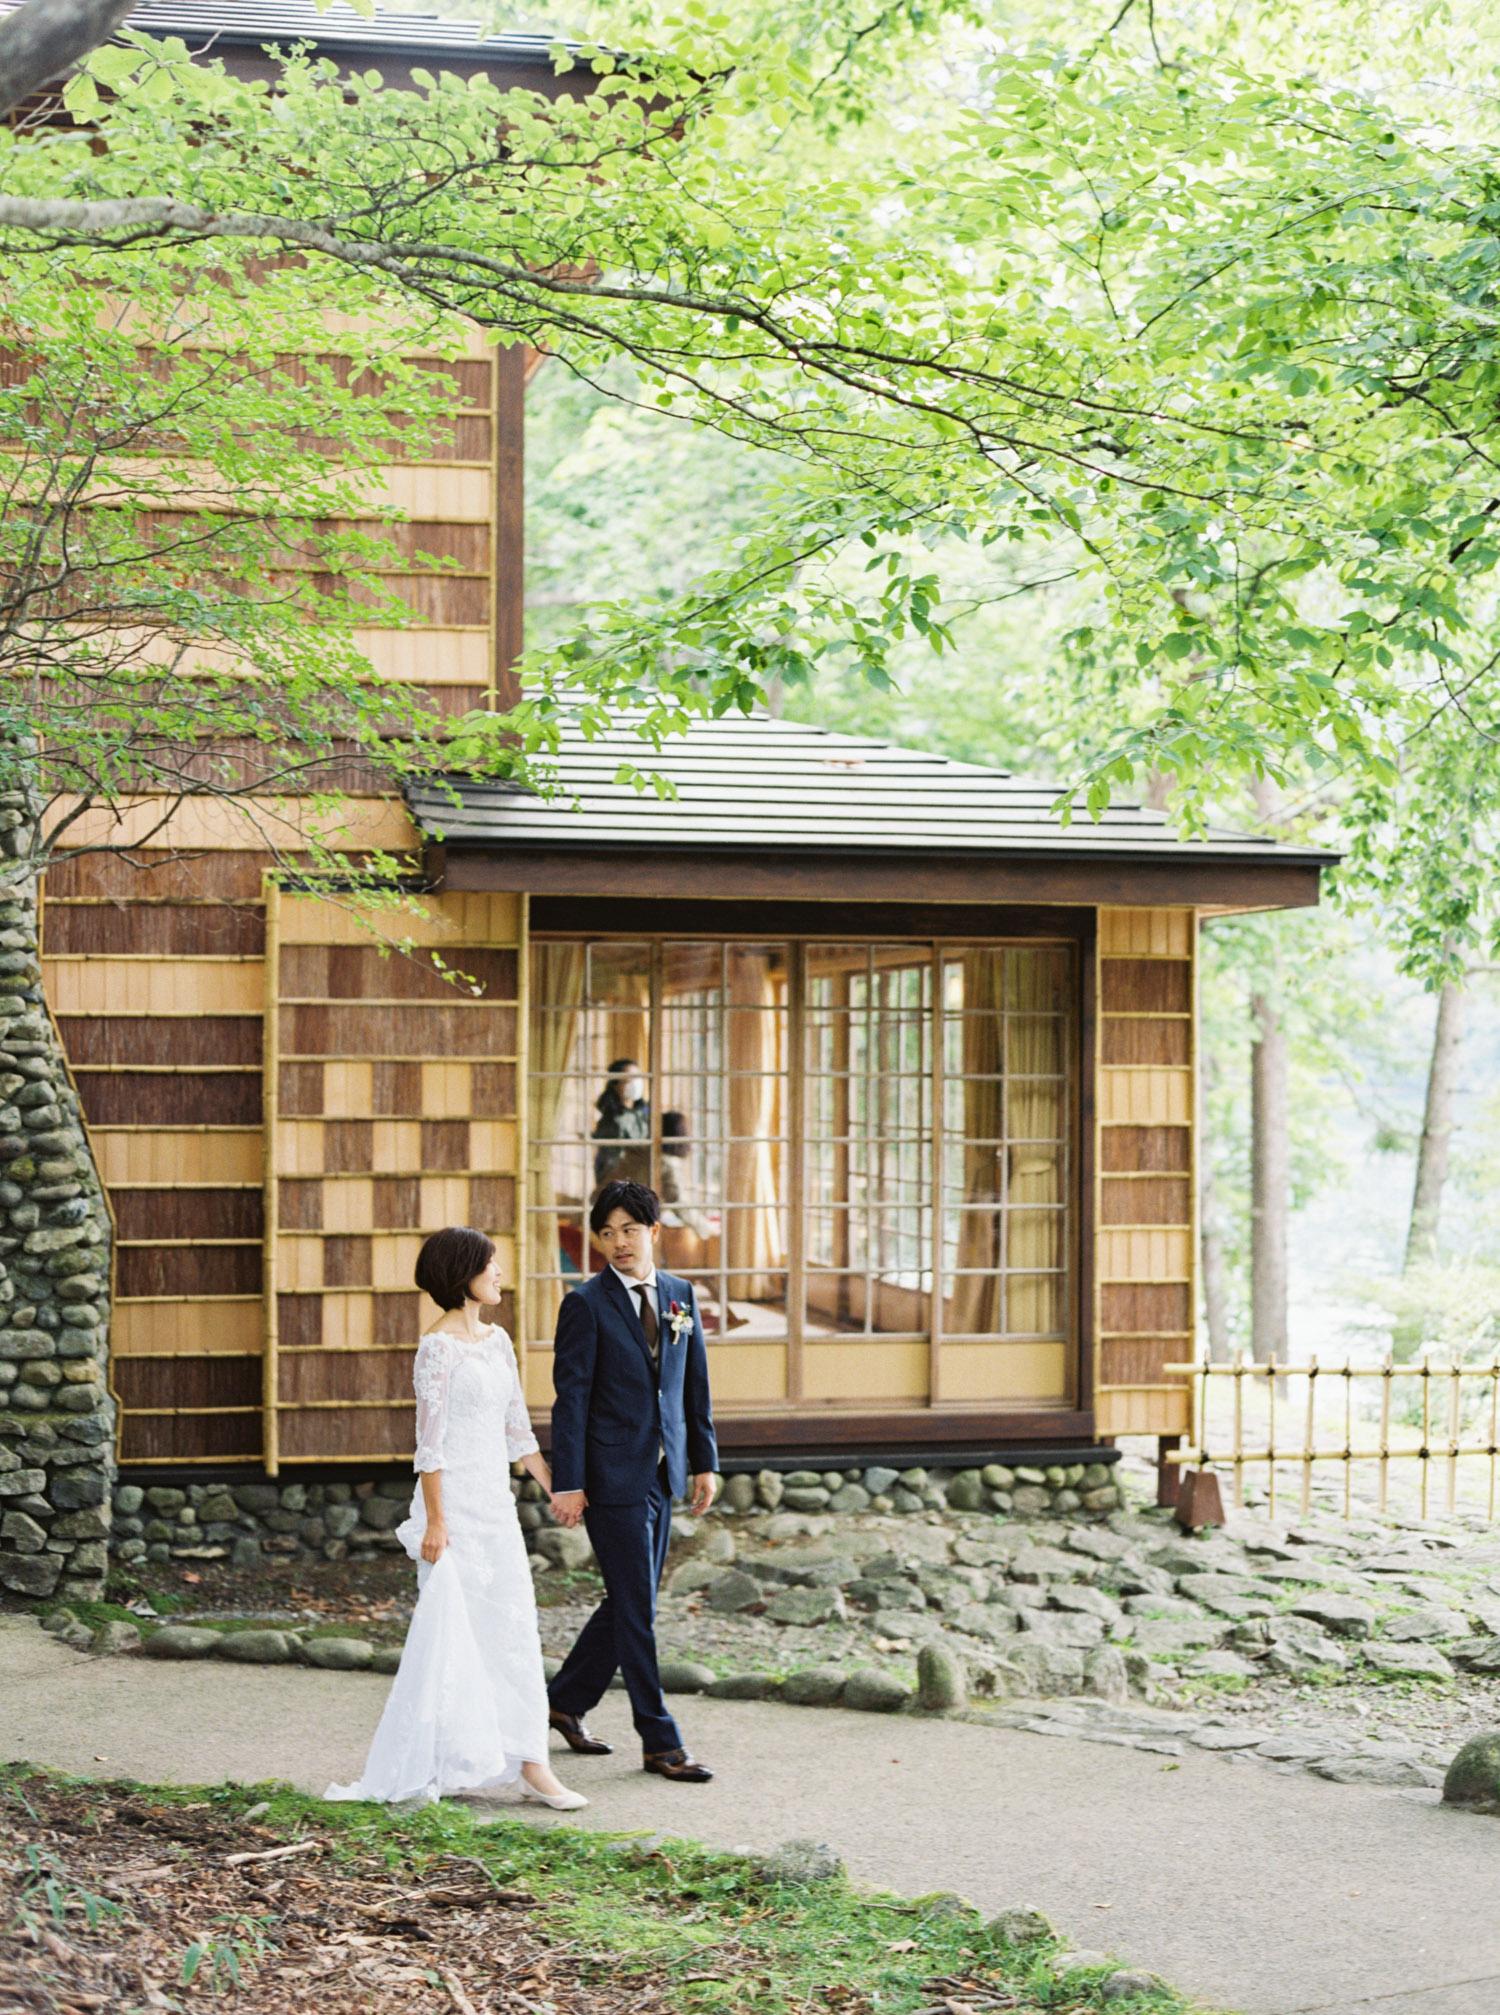 日本 日光婚紗-Nikko-義大利大使館別墅紀念公園-Tochigi, Nikko